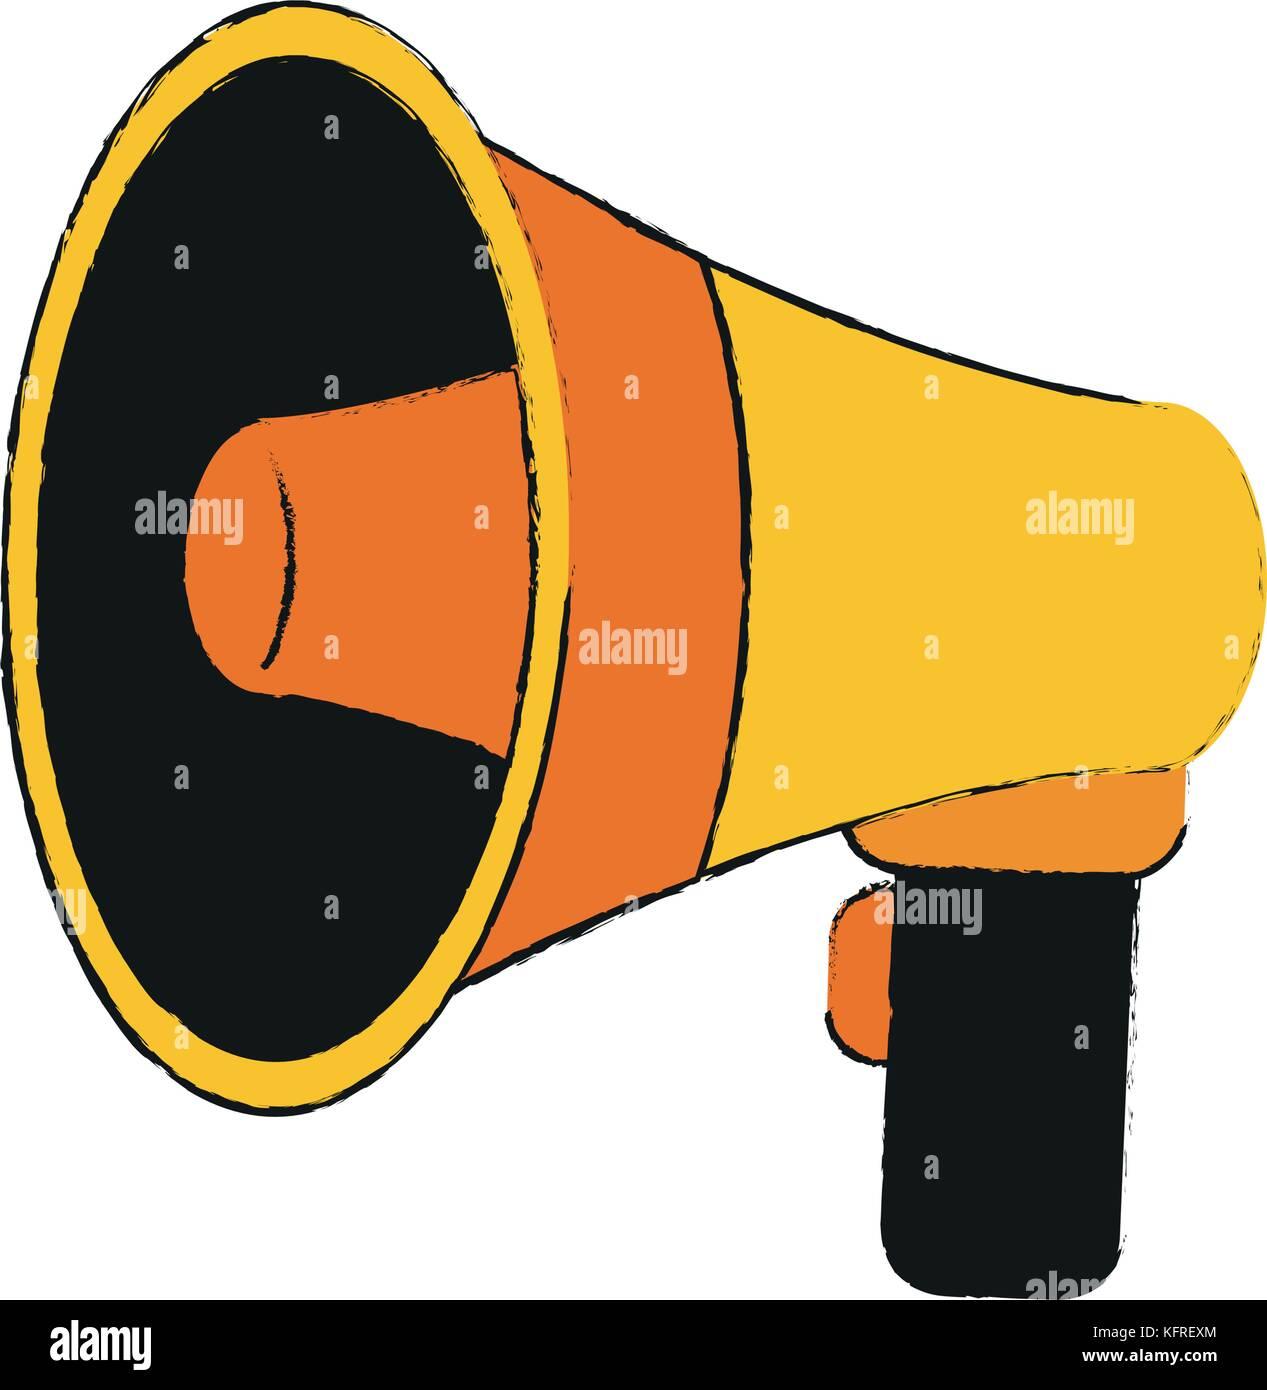 Bullhorn megaphone sketch stock photos bullhorn megaphone sketch bullhorn or megaphone icon image stock image publicscrutiny Gallery